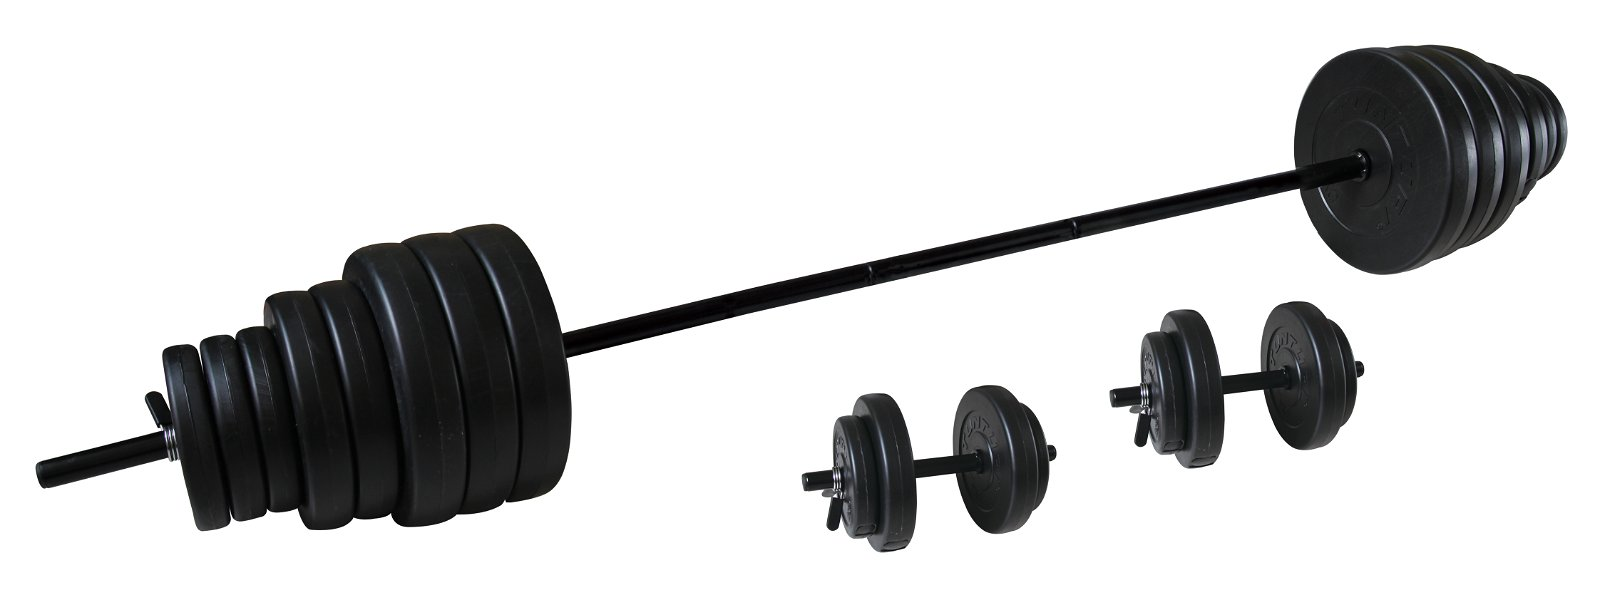 Tunturi Vinyl Barbell/Dumbbell Set 50Kg